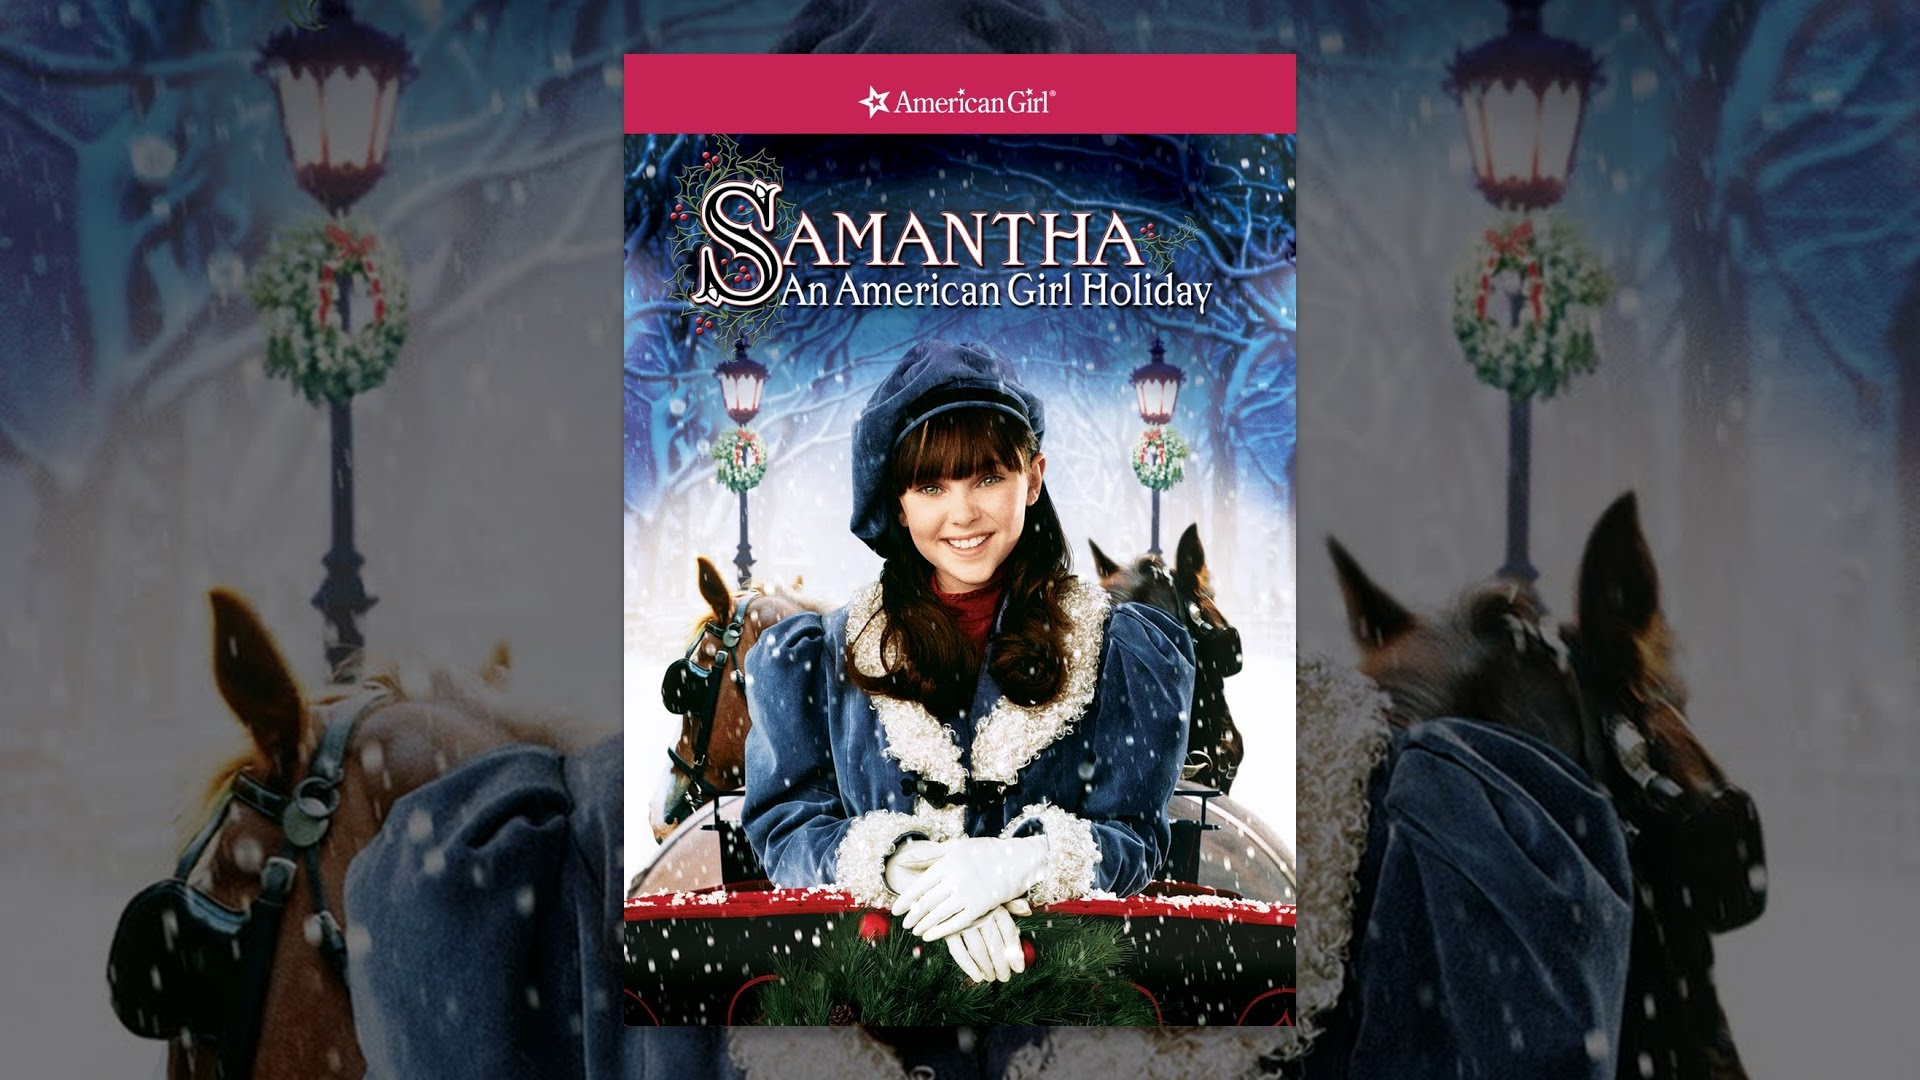 samantha an american girl holiday youtube